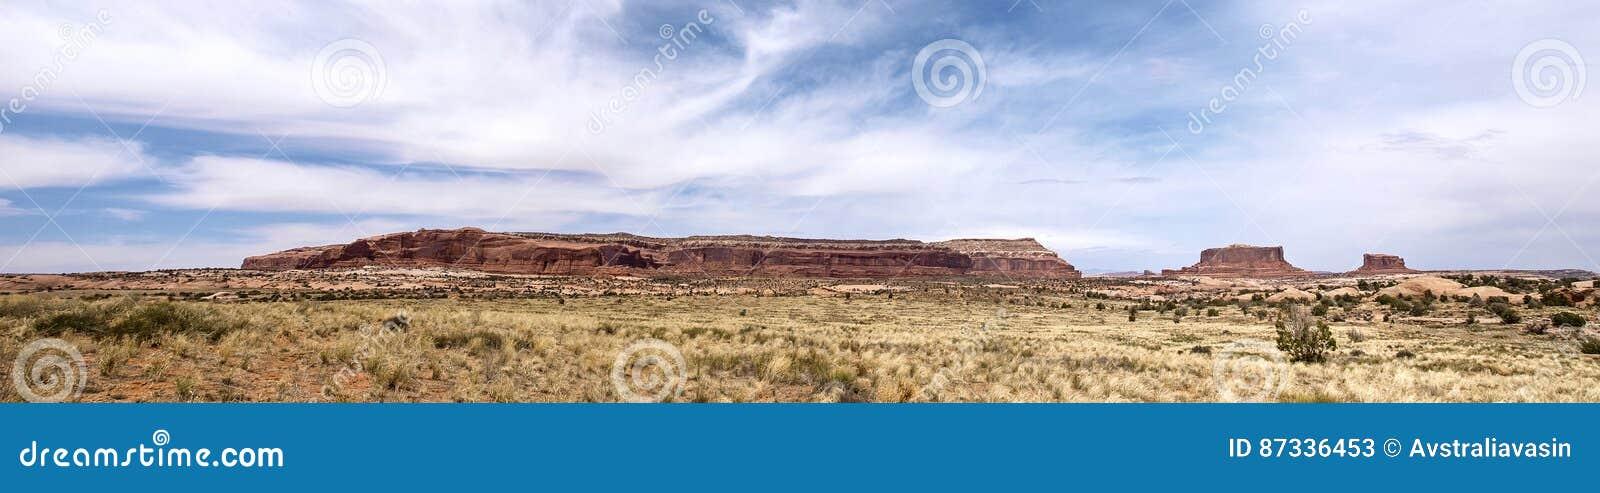 Dead Horse Point, Colorado river, Utah, USA.